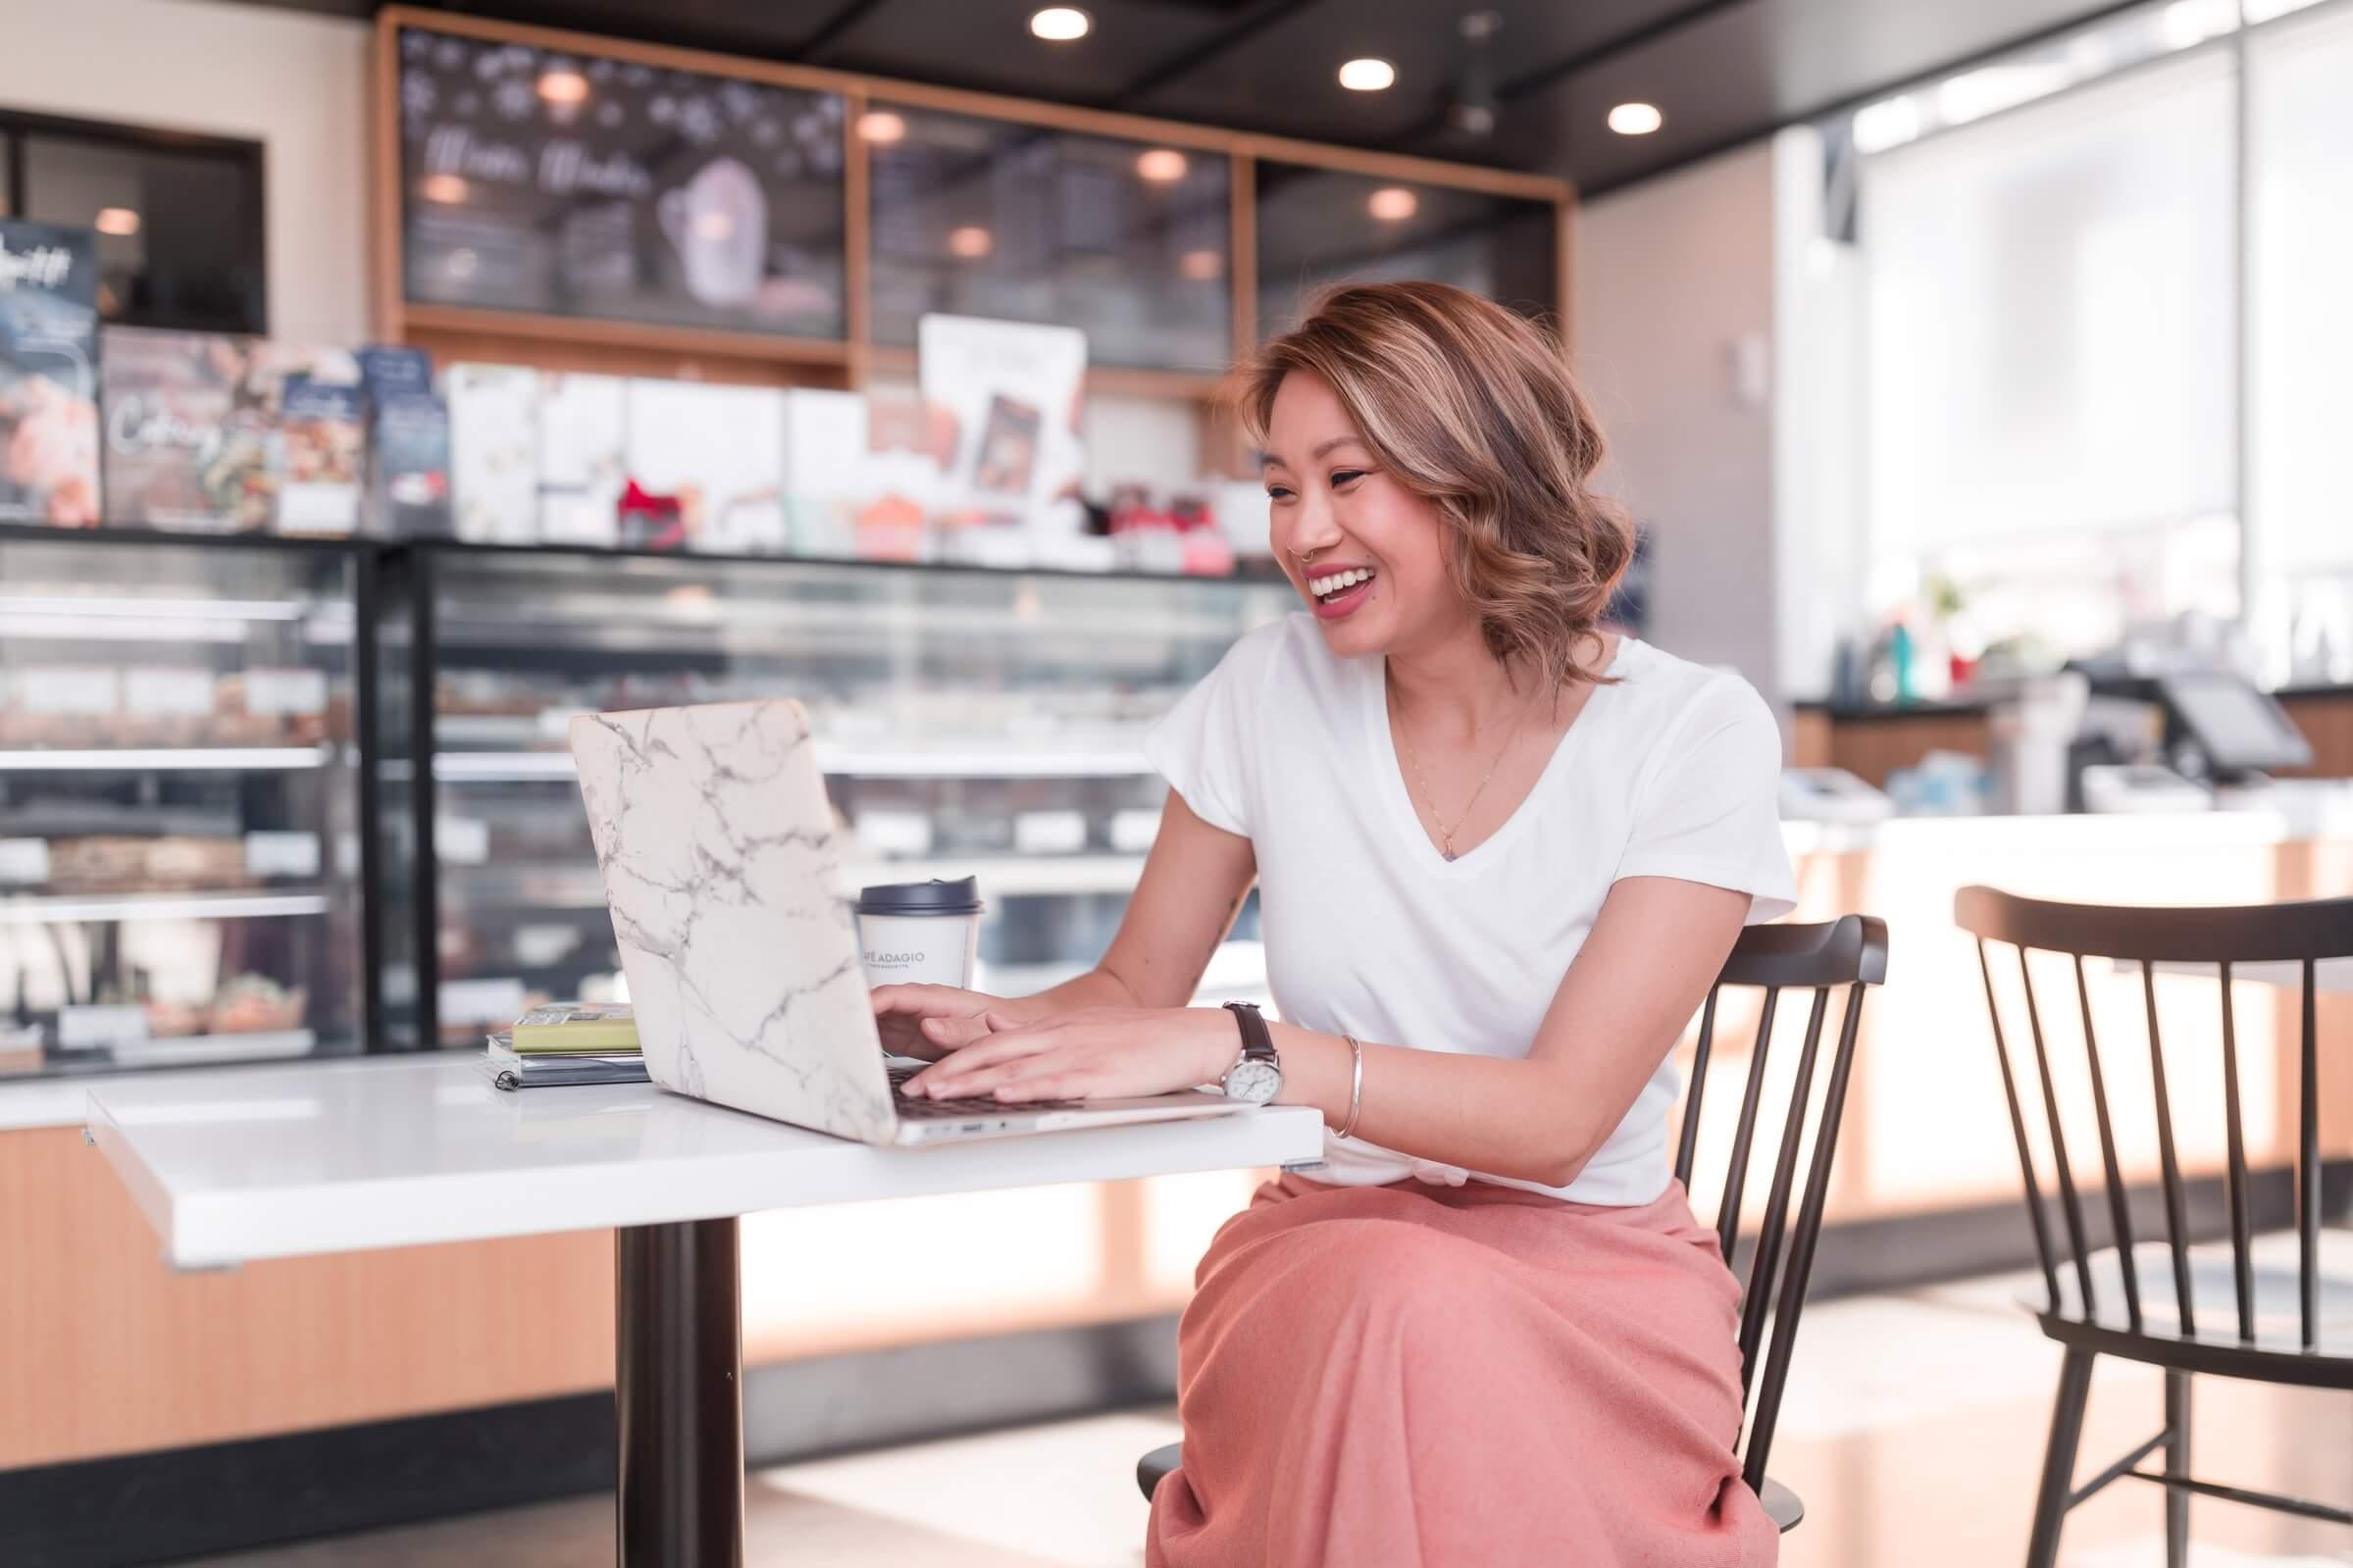 copywriter working in cafe, website copywriter for service providers, website copywriter for small businesses